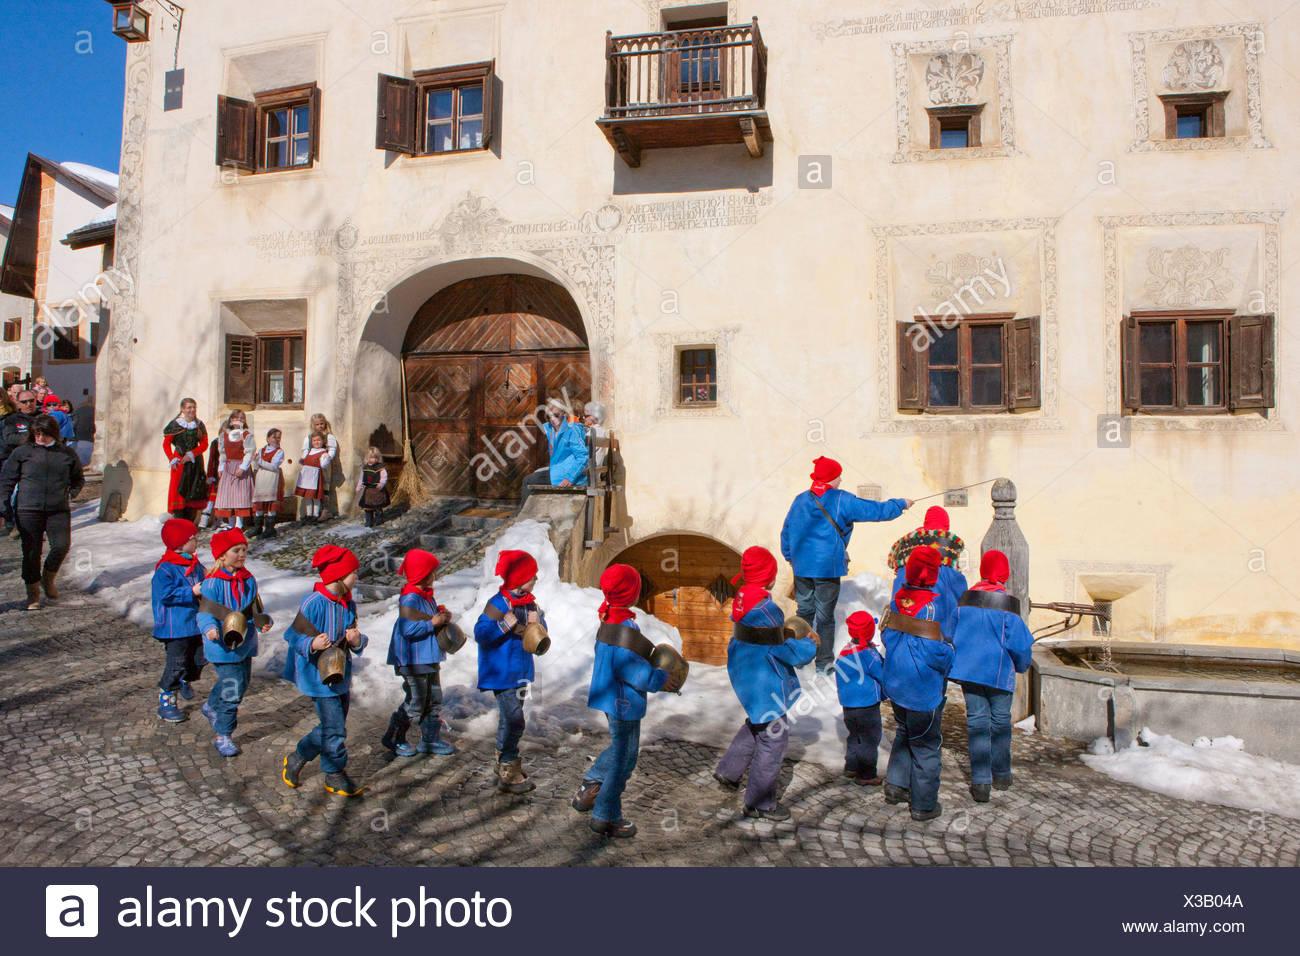 Chalandamarz, custom, Guarda, Unterengadin, tradition, folklore, national costumes, child, children, national costumes, national - Stock Image